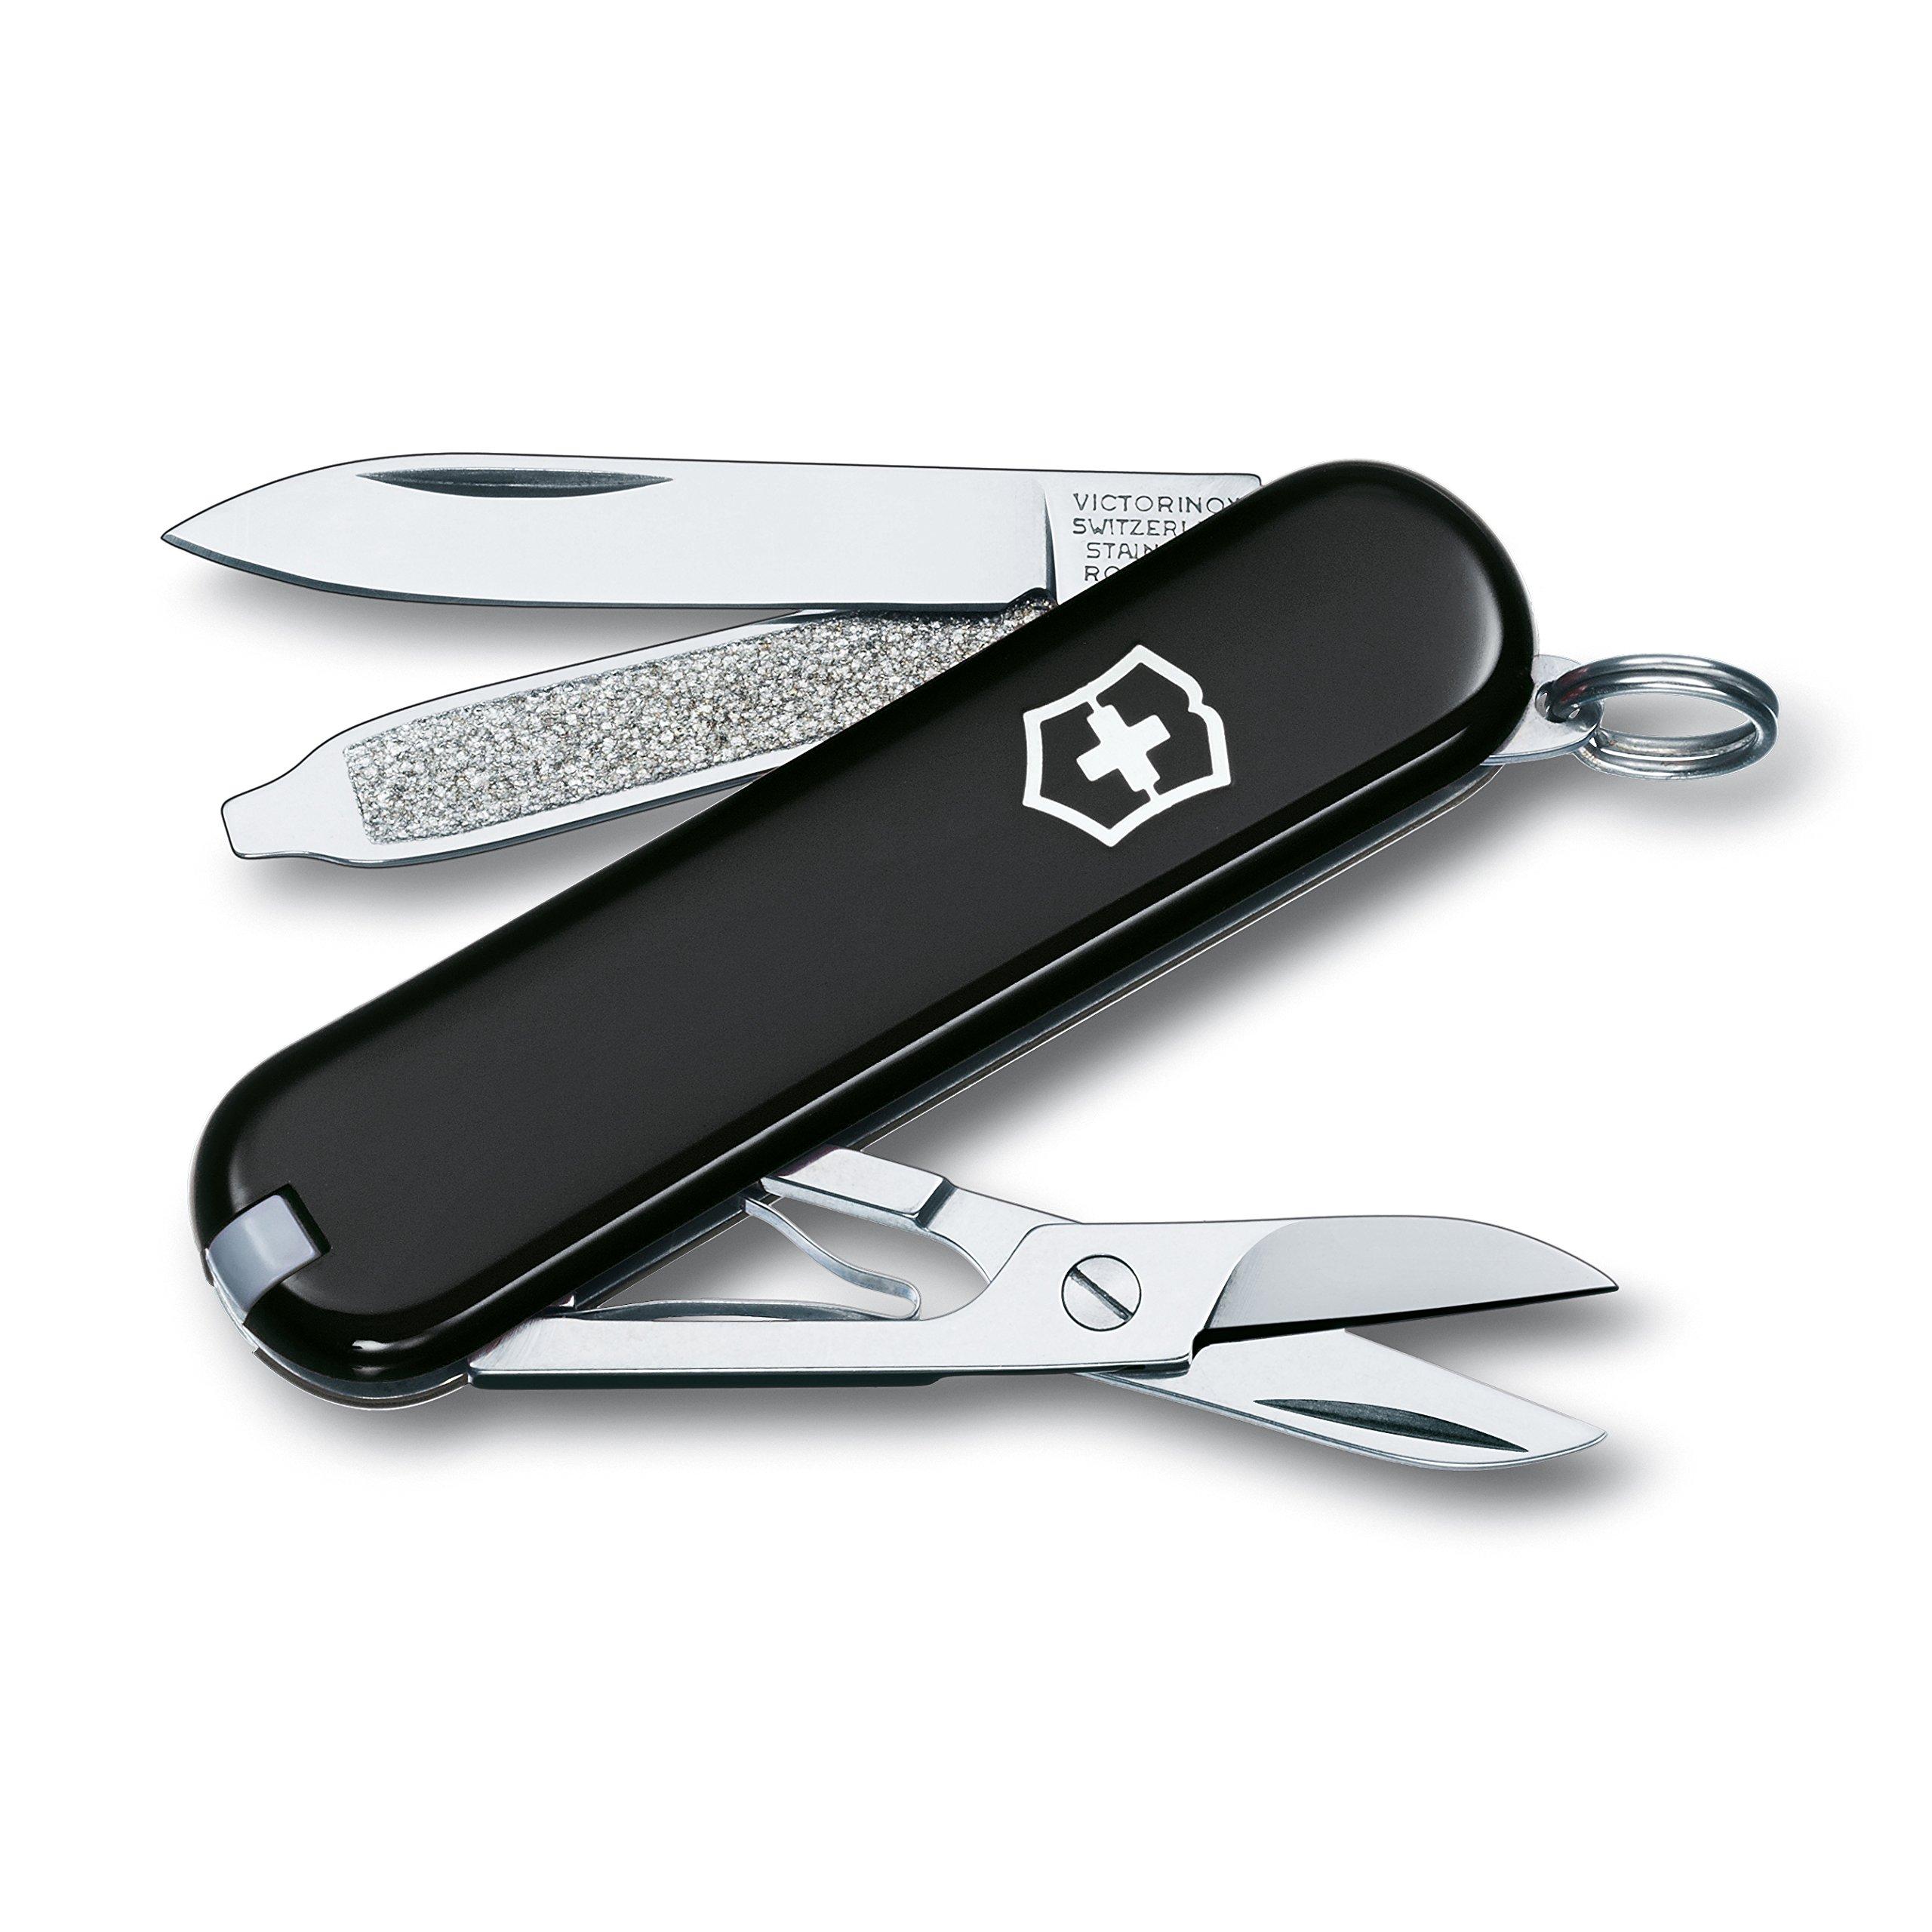 Victorinox Swiss Army Classic SD Pocket Knife, Black, 58mm by Victorinox